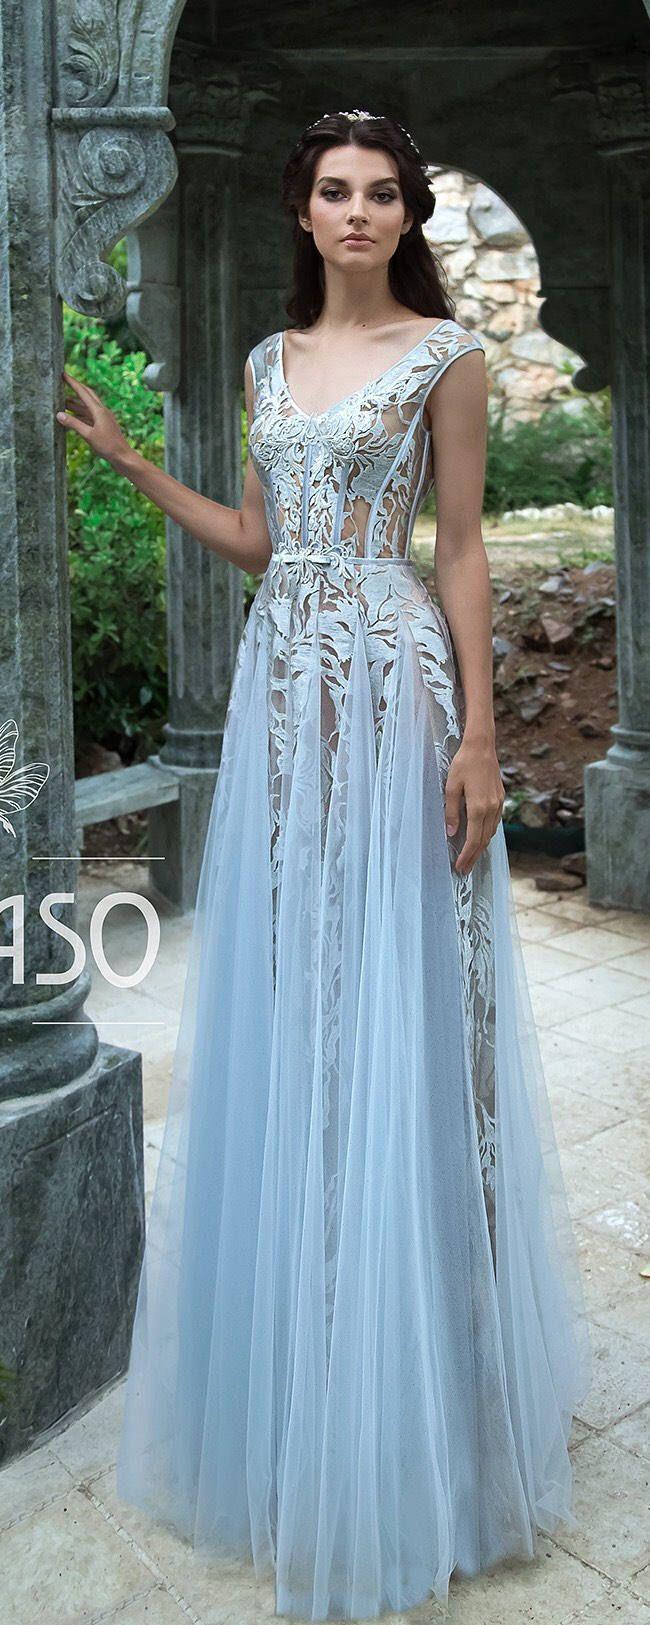 Bohemian ALine Wedding Dresses Lace Short Cap Sleeve VNeck Open